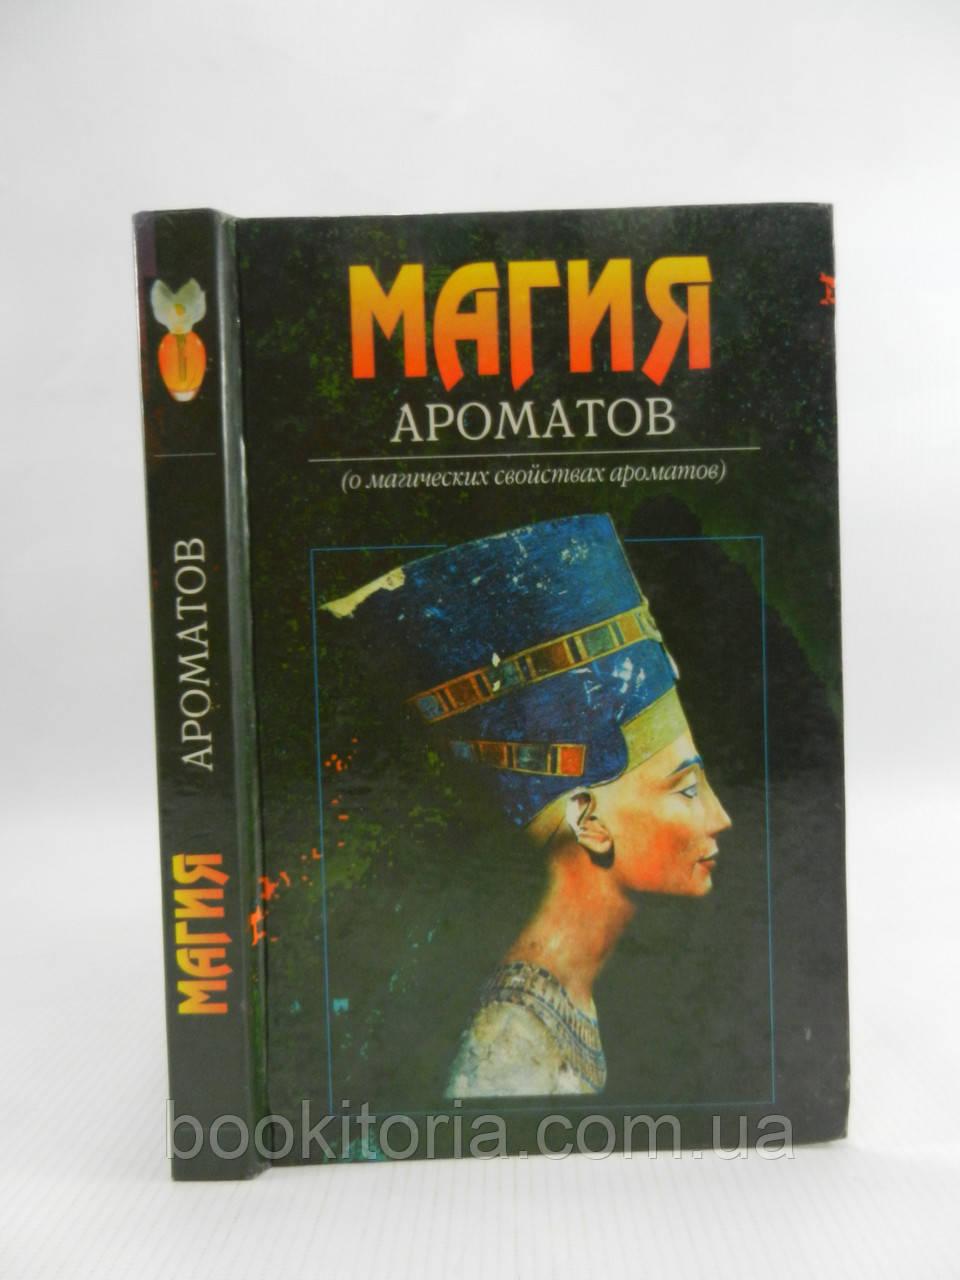 Магия ароматов (б/у).